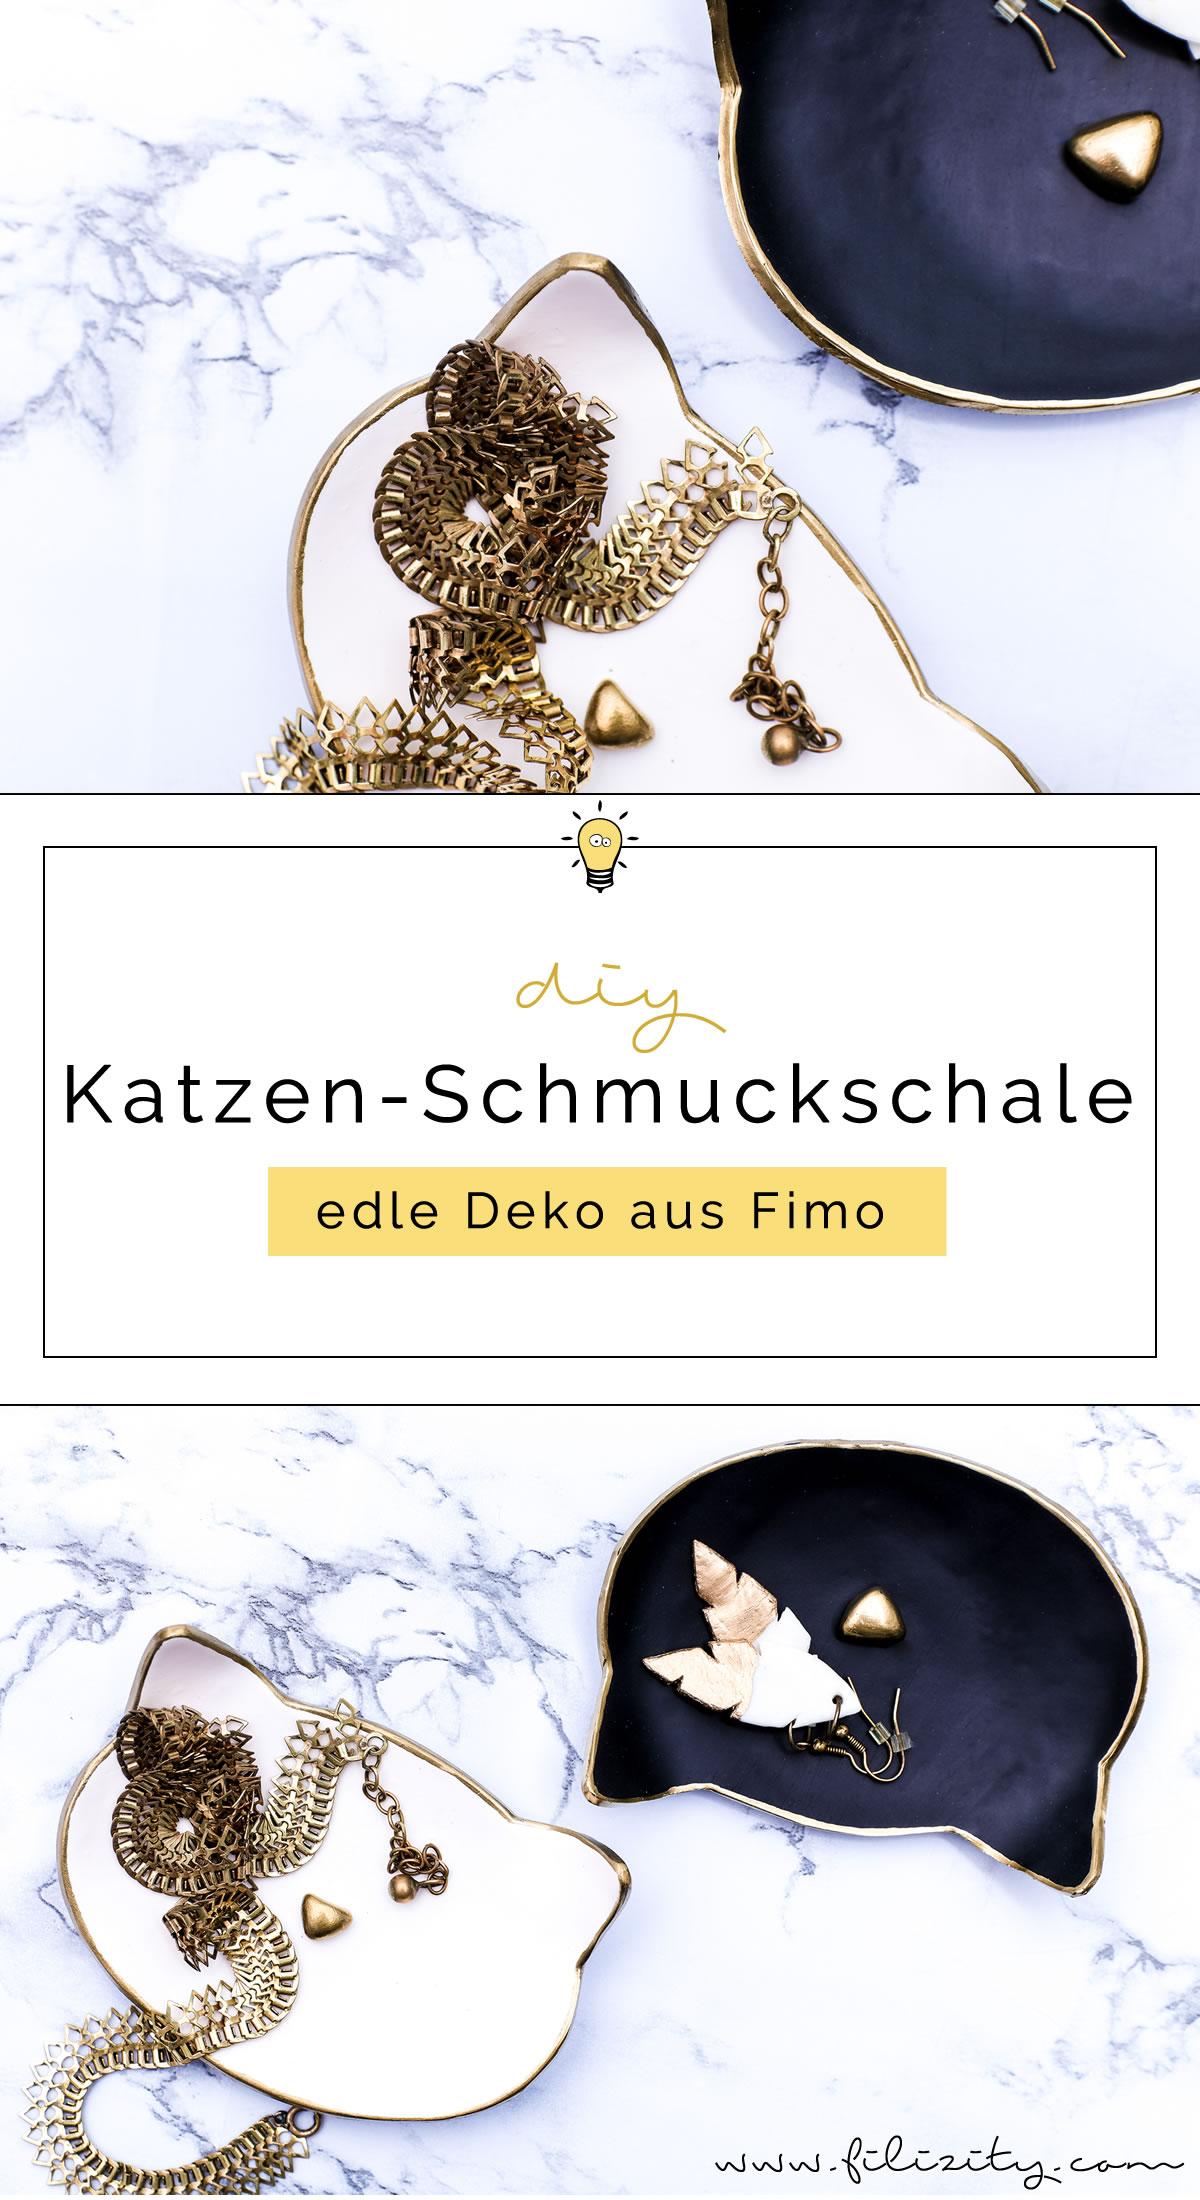 Katzen-Schmuckschalen aus Fimo selber machen | DIY Deko & Geschenkidee | Filizity.com | DIY-Blog aus dem Rheinland #fimo